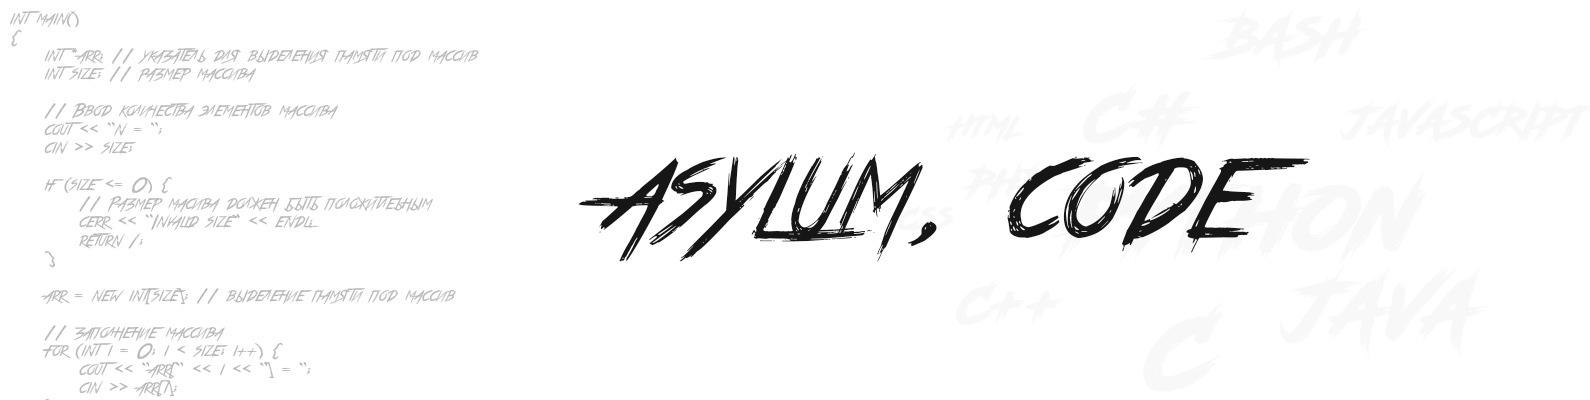 asylum, code | ВКонтакте